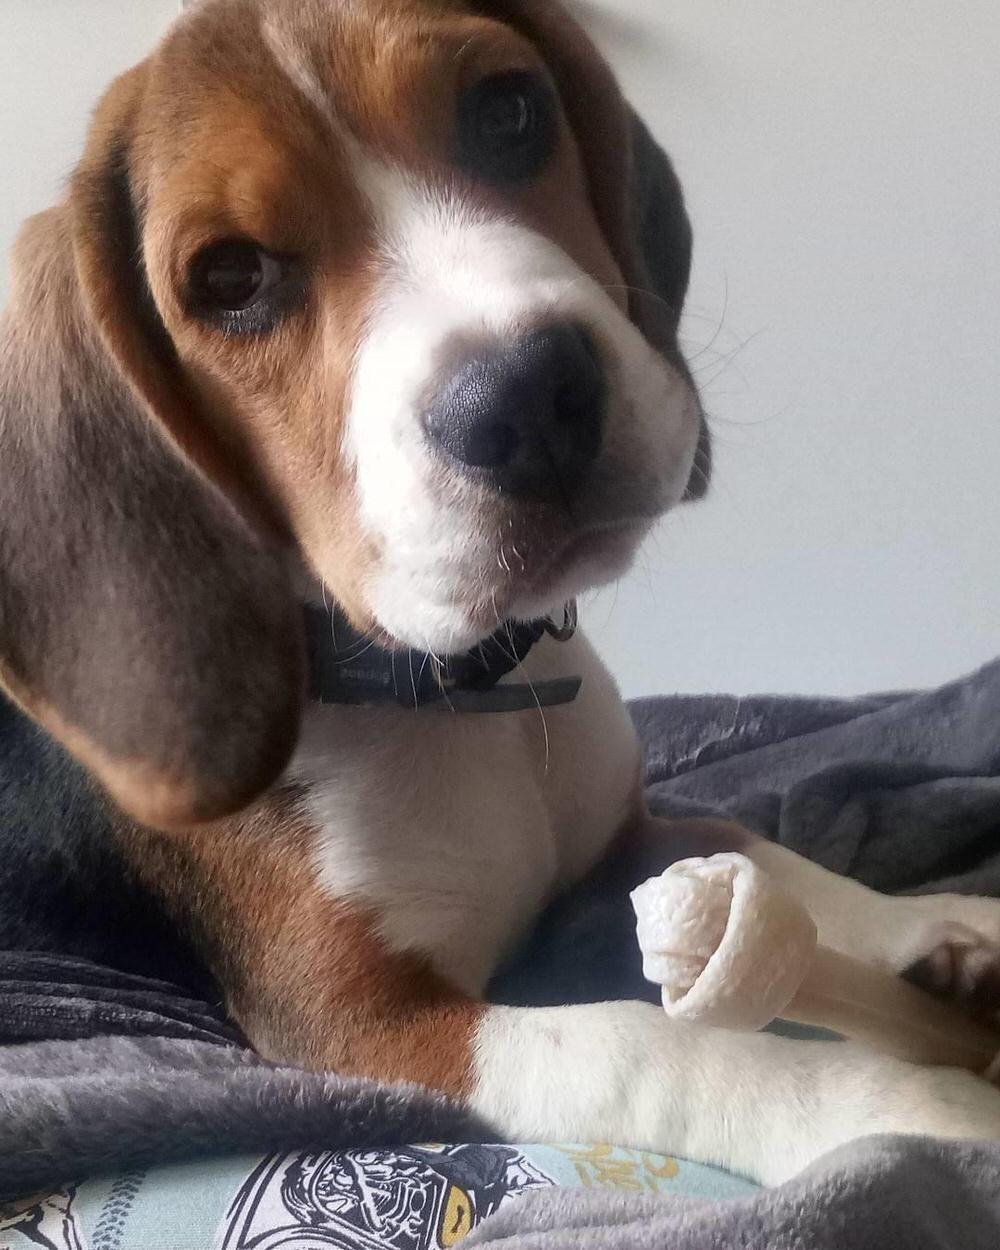 Popular Video Beagle Adorable Dog - 7a50cb1f265a7414ff643e72bc271fc3  Trends_2661  .jpg